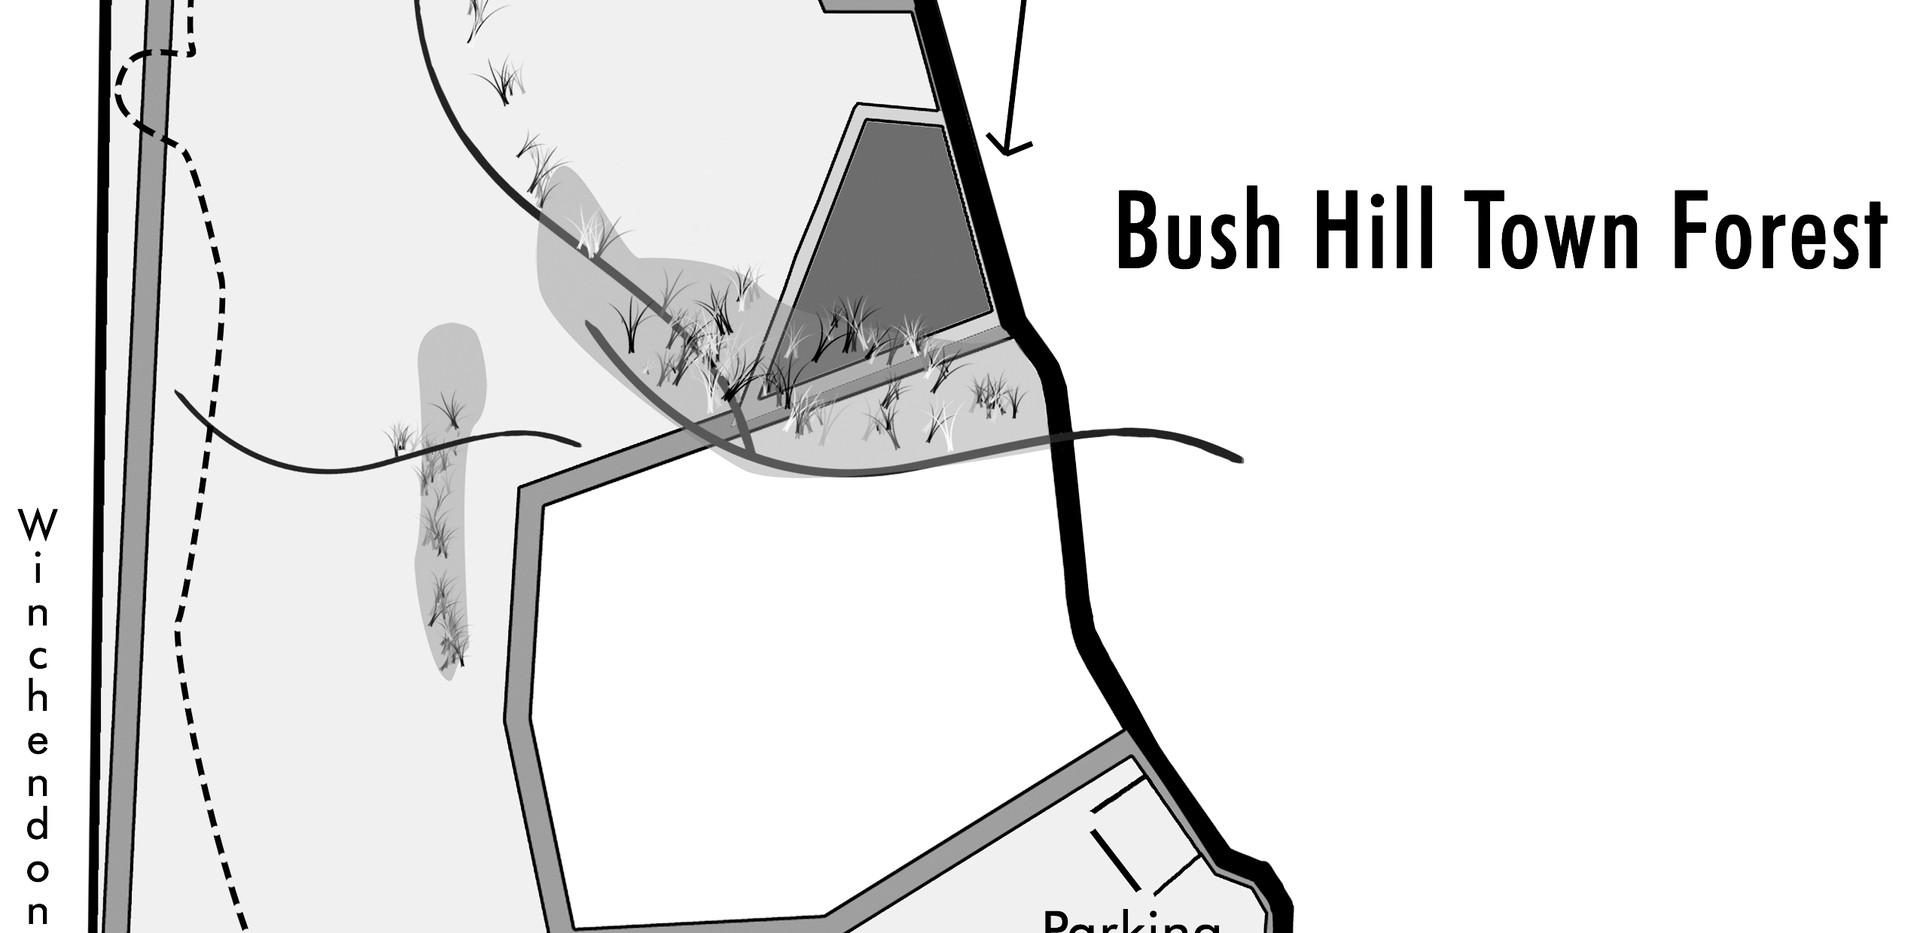 BushHilltrail.1.jpg